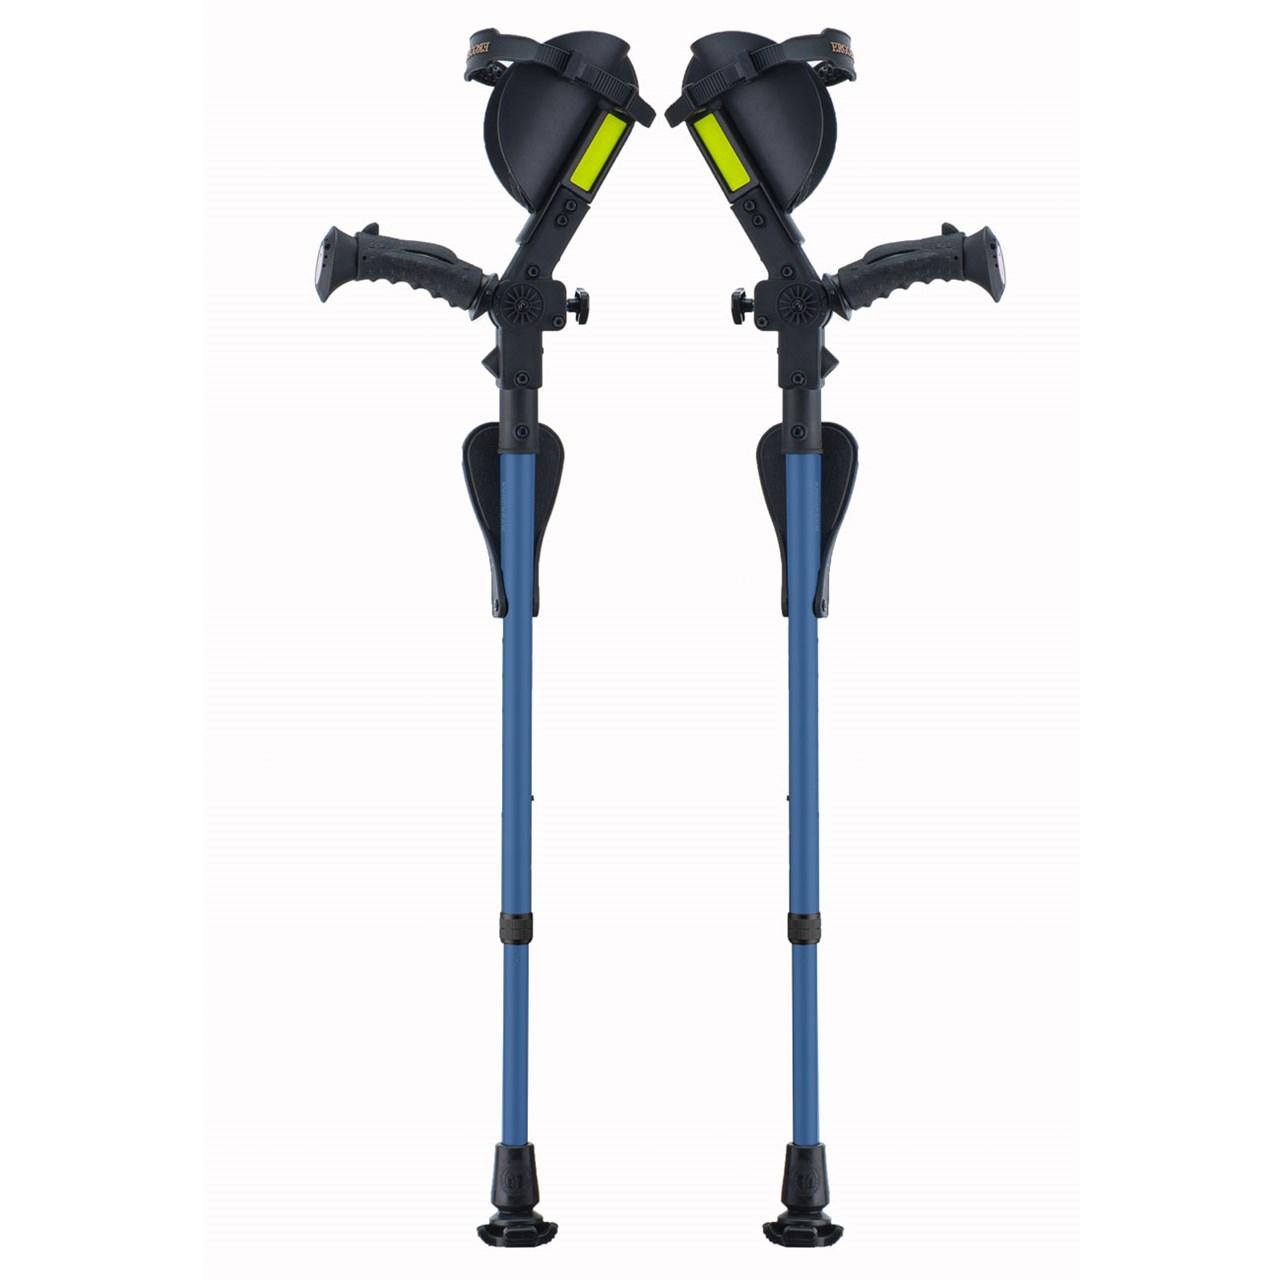 Ergobaum Junior Ergonomic Forearm Crutches - Juvenile -Blue